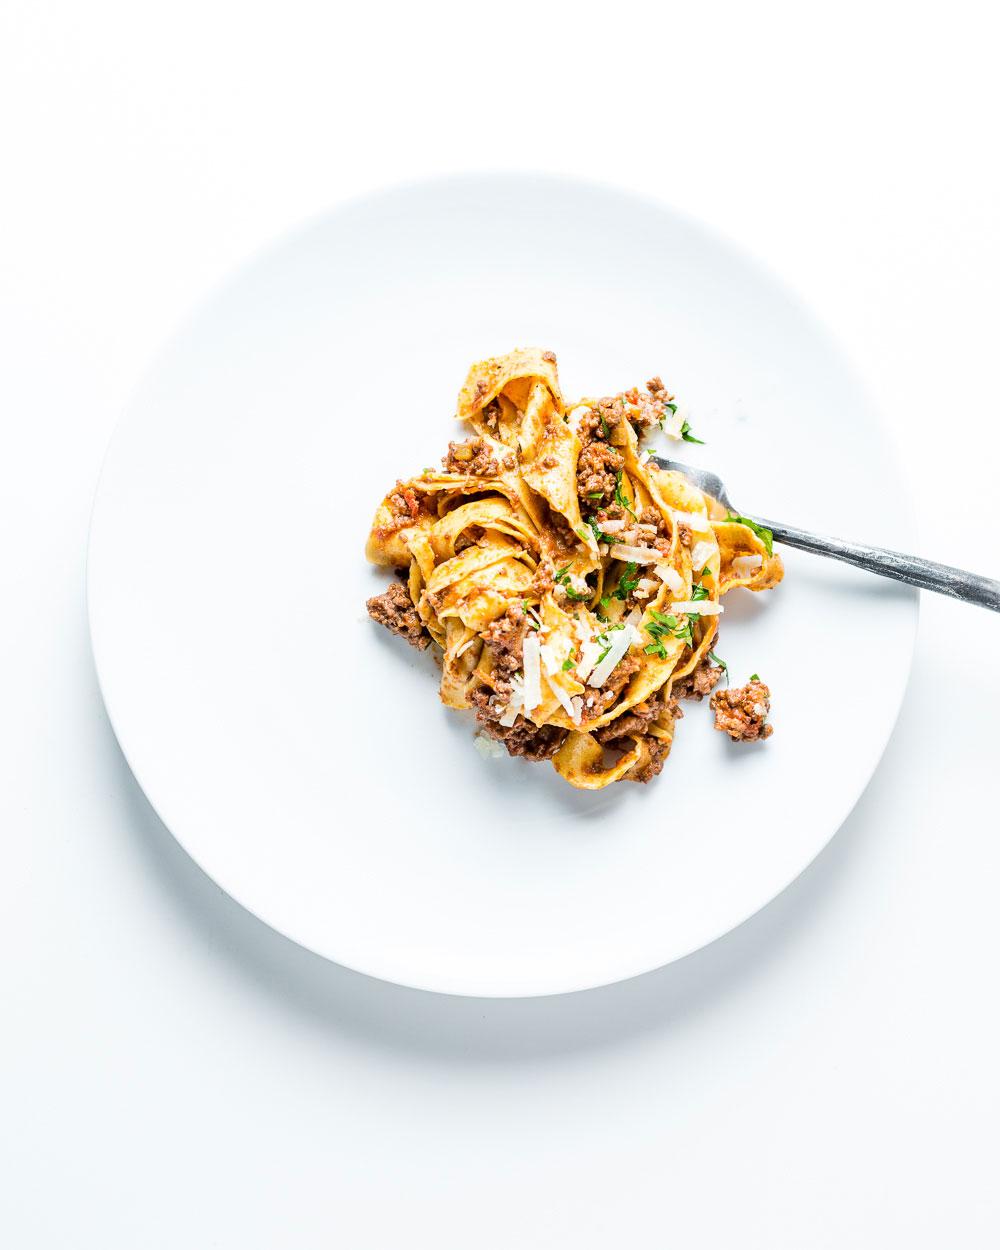 Pasta Bolognese on White Plate Overhead